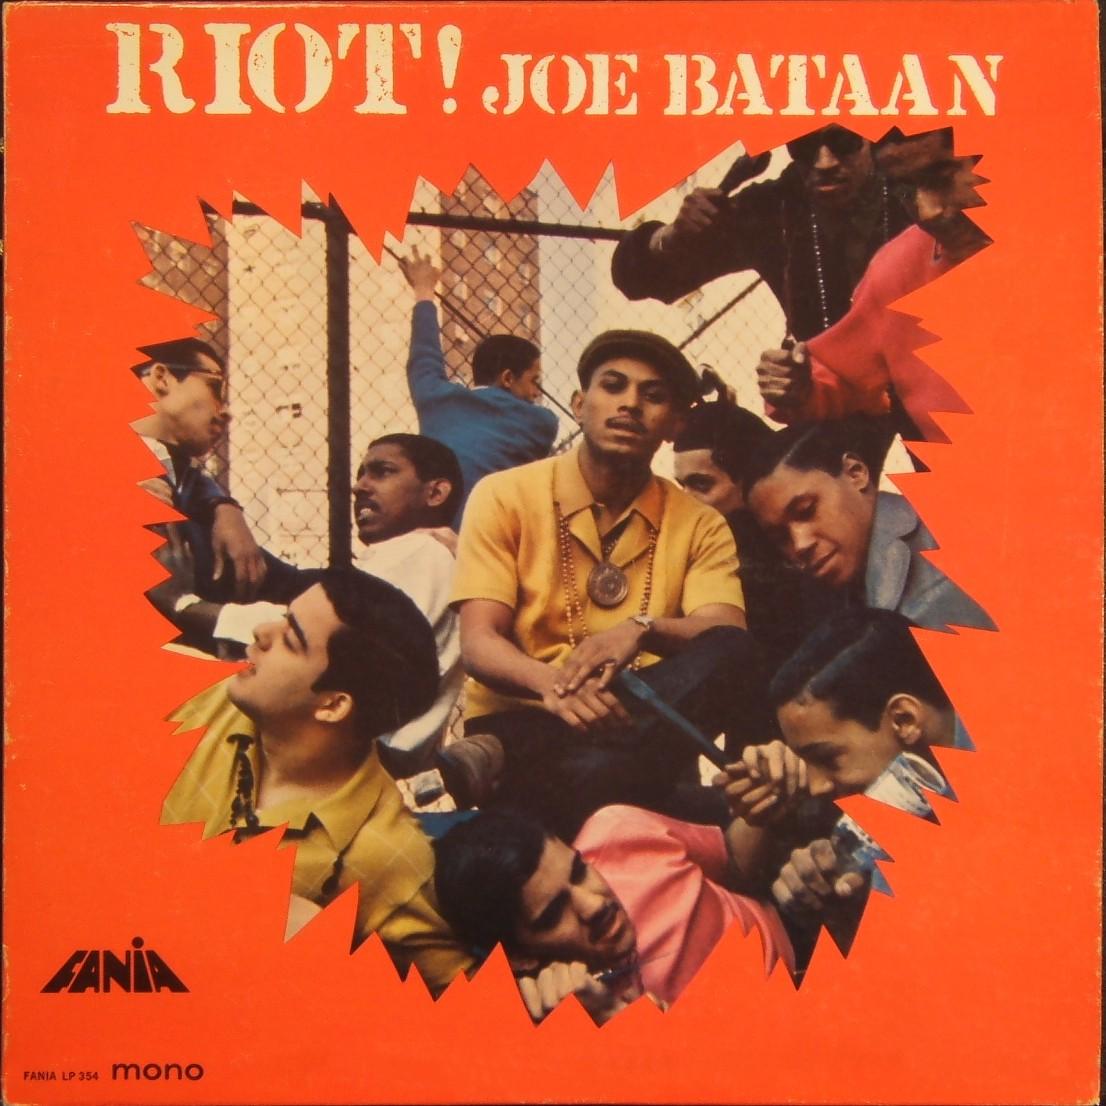 joe-bataan-riot-fania-mono-front